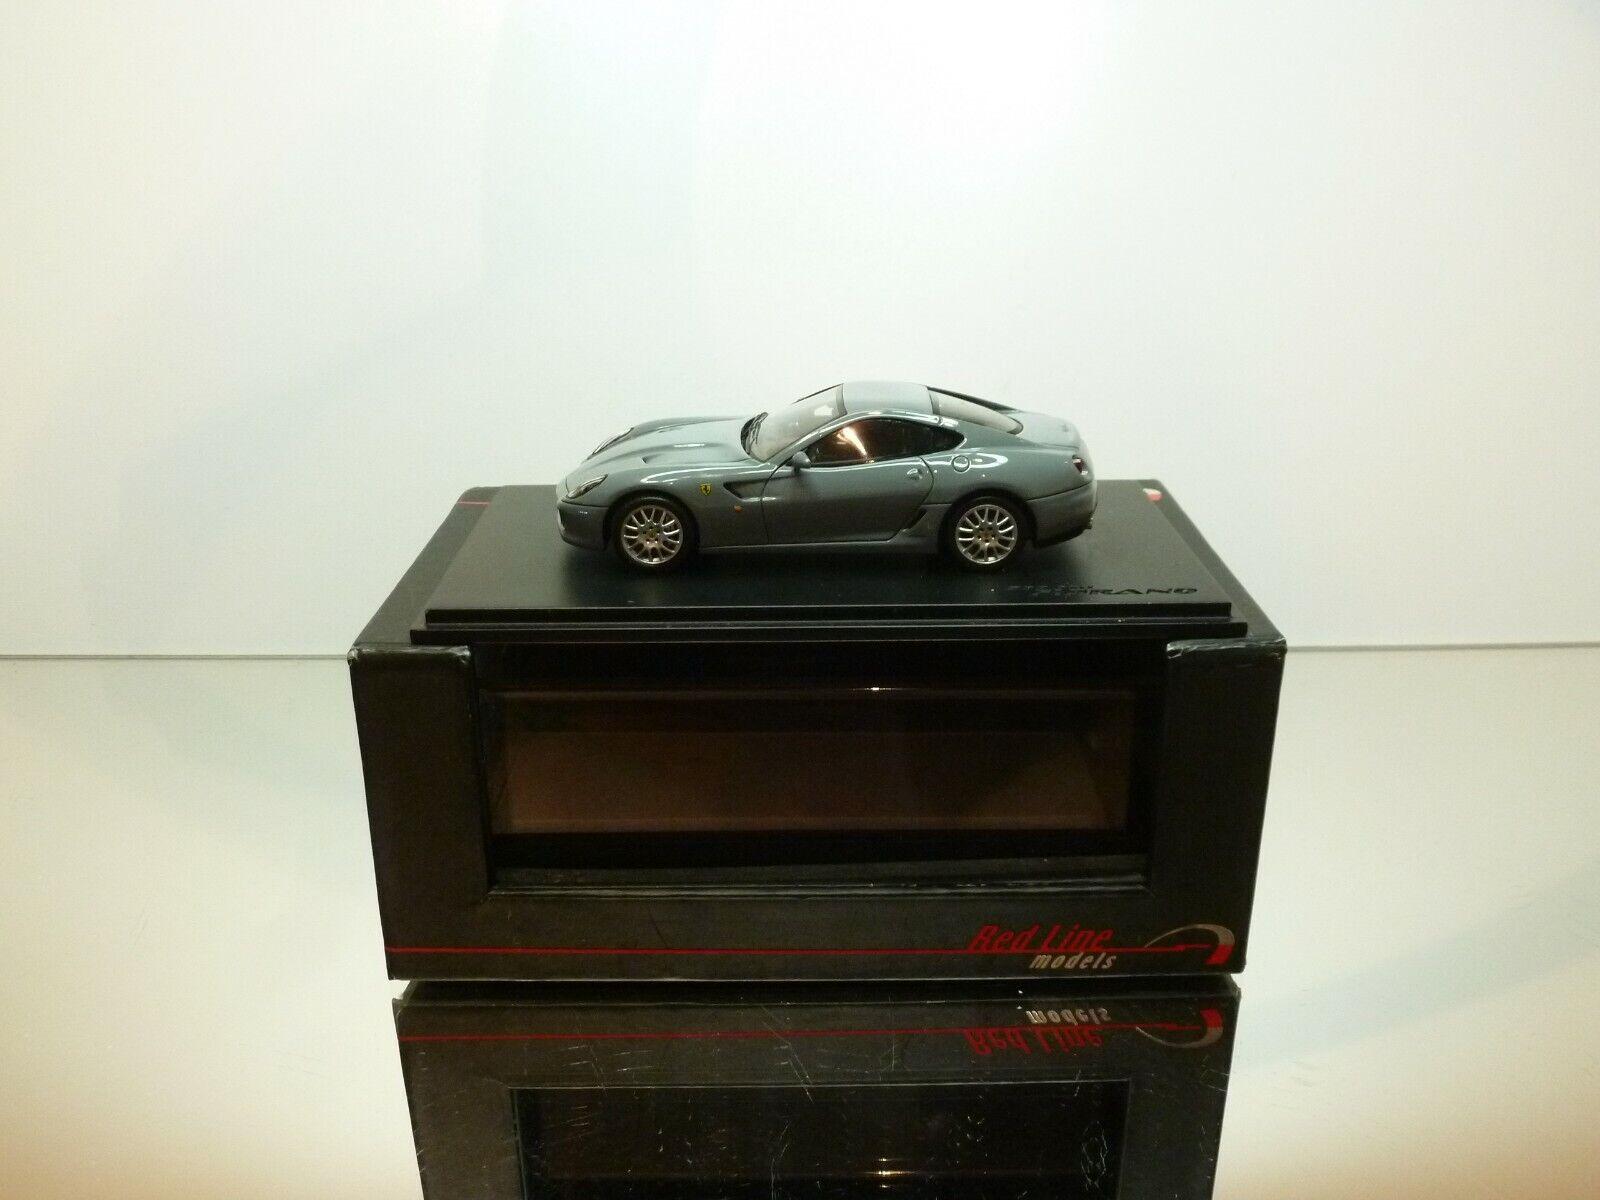 rosso LINE MODELS RL147 FERRARI 599 GTB FIORANO - RARE grigio 1 43 - EXCELLENT IB